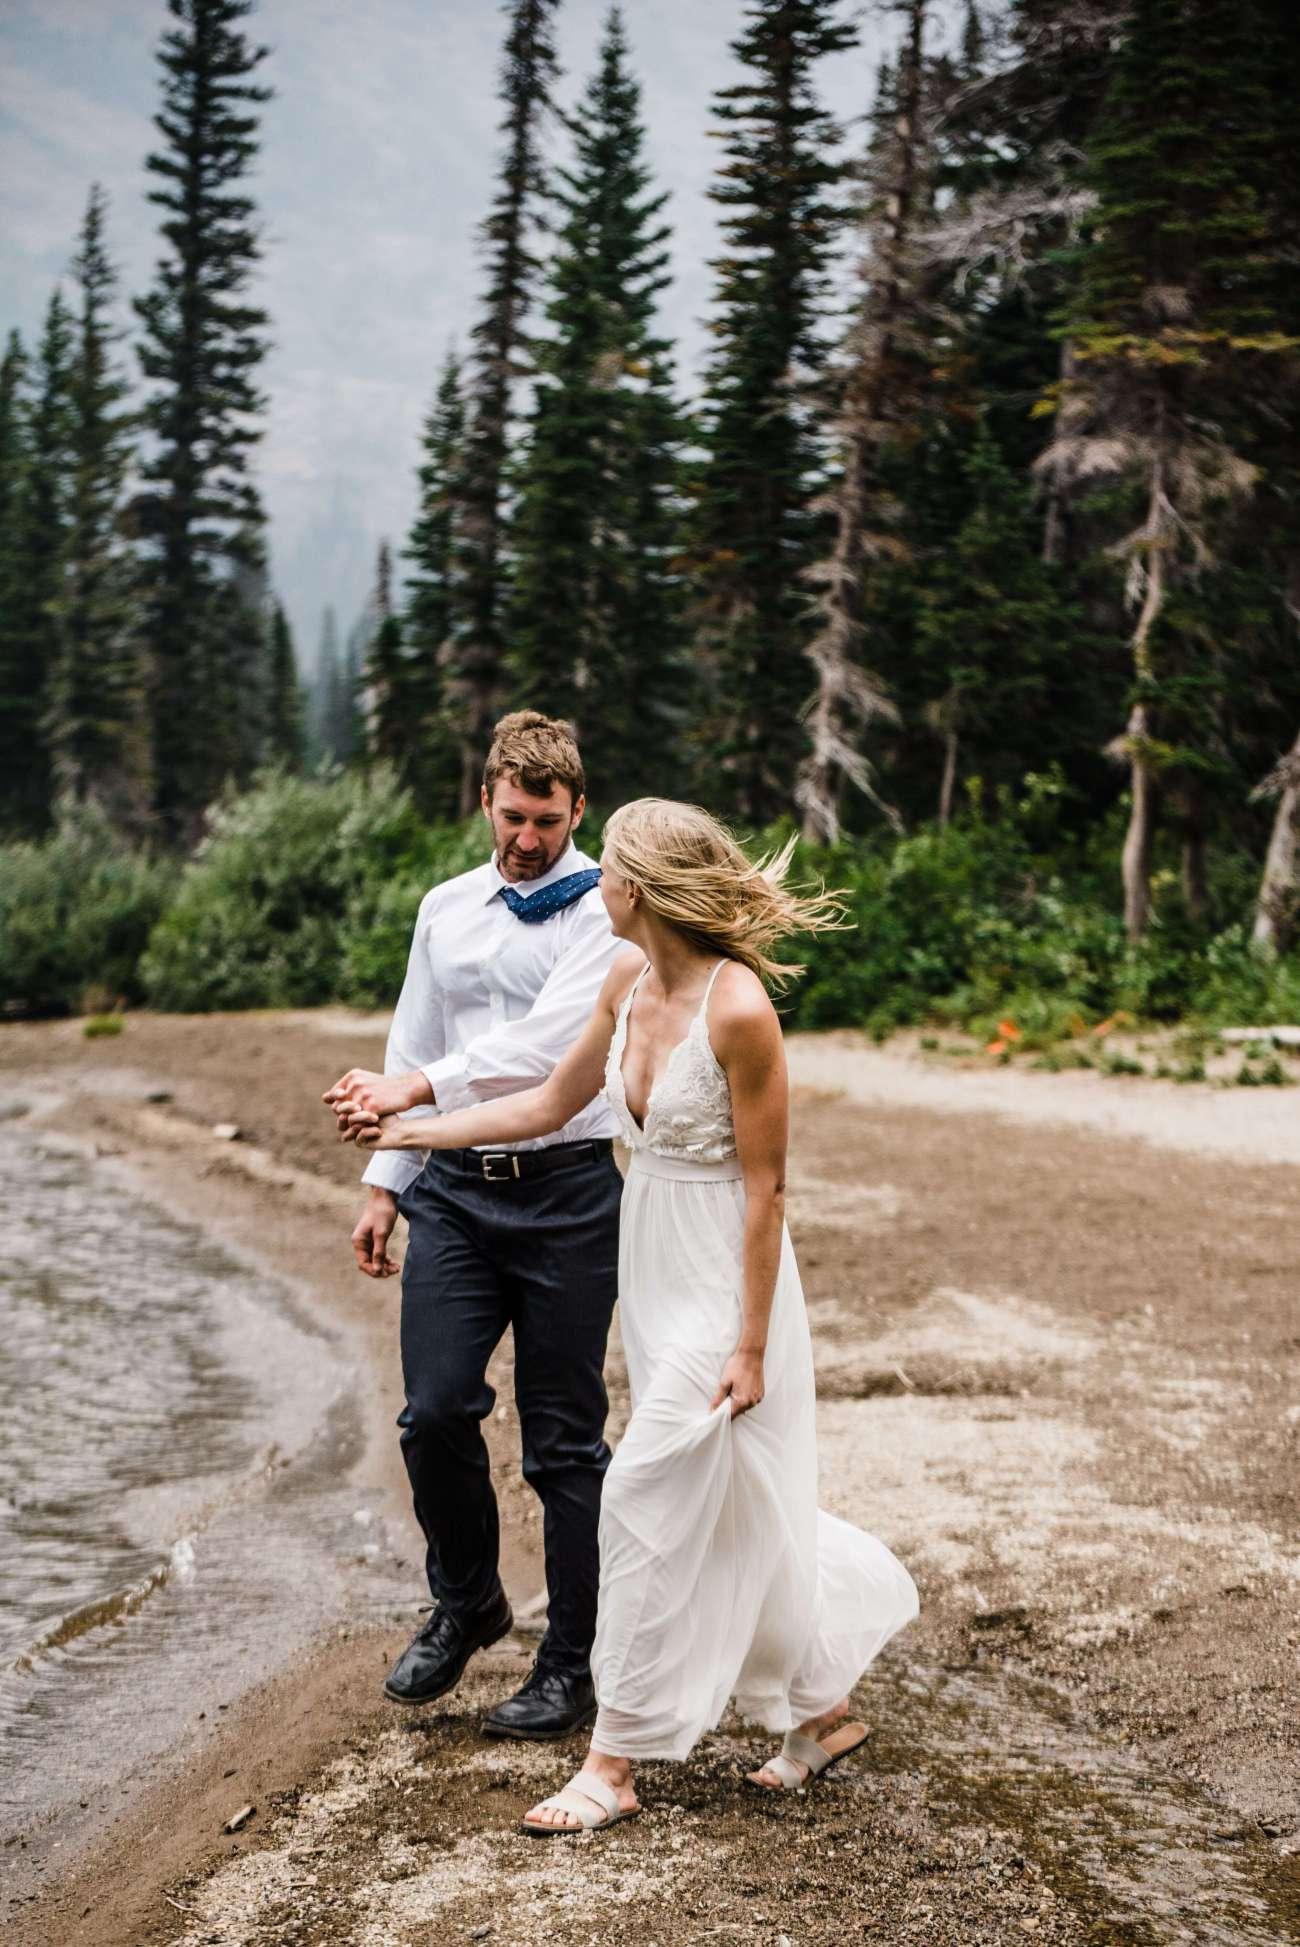 Grinnell Glacier,Many Glacier,S Photography,adventure elopements,adventure wedding,elope,elopement,elopement photographer,glacier,glacier national park,montana,mountain,mountain elopement,rockies,rocky mountain,